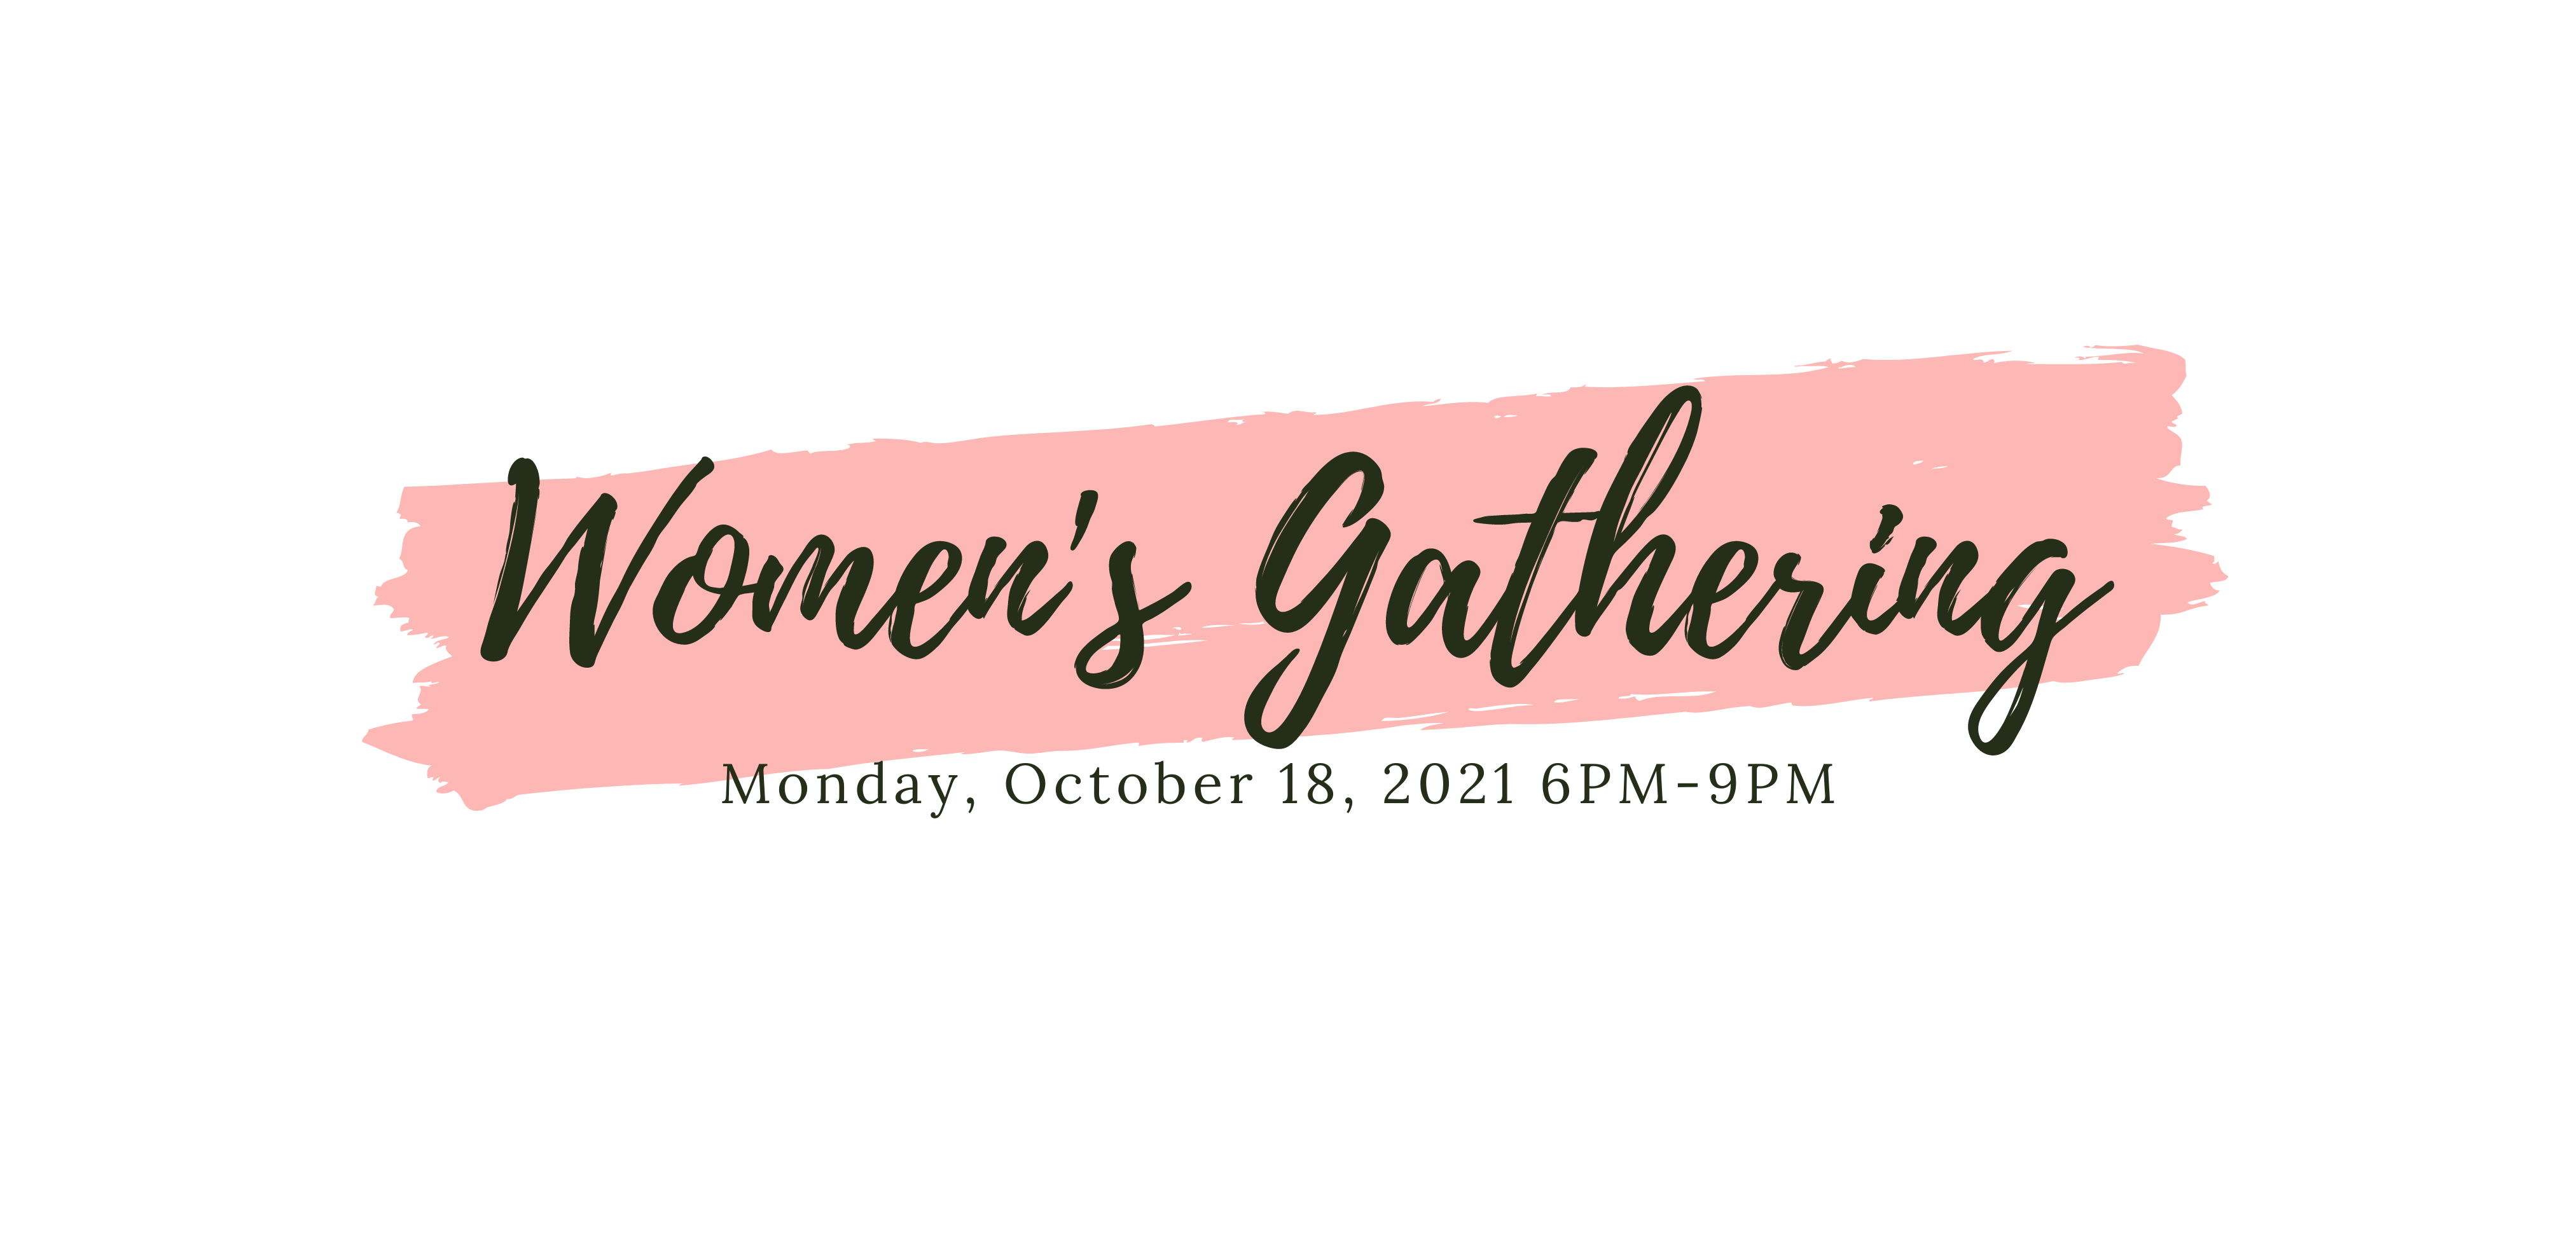 Women's Gathering Banner